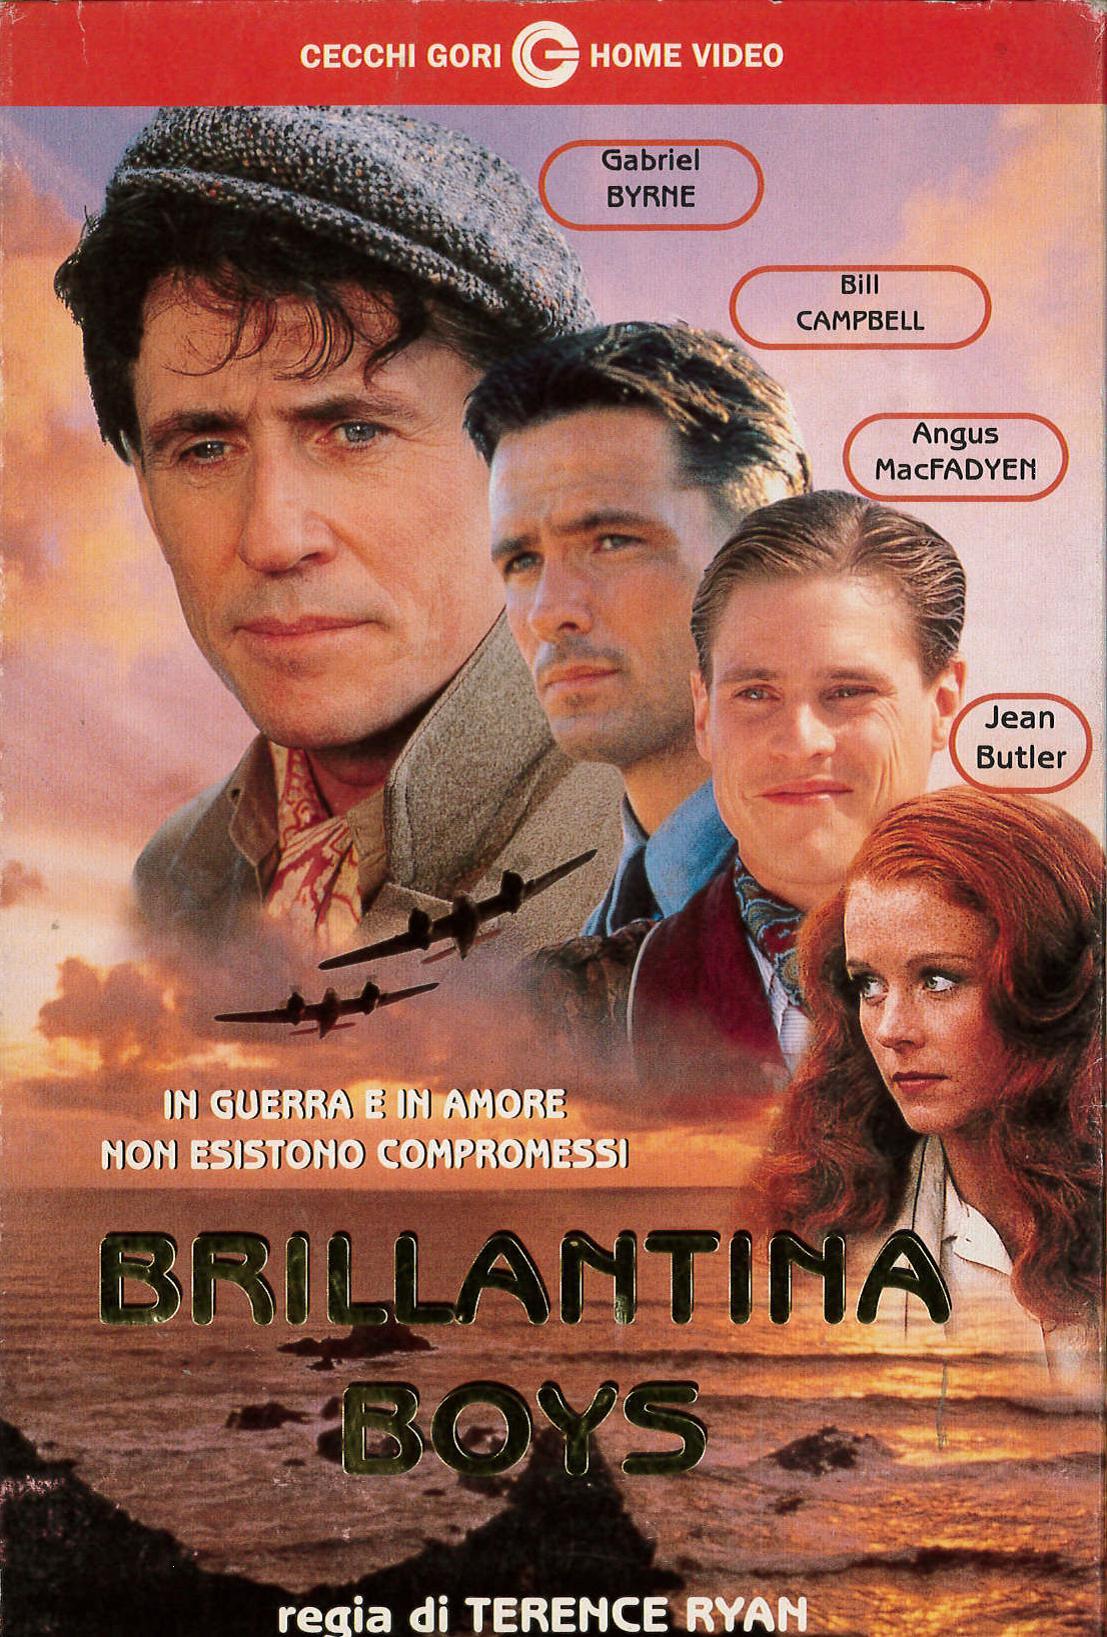 BRILLANTINA BOYS - VHS EX NOLEGGIO (VHS)